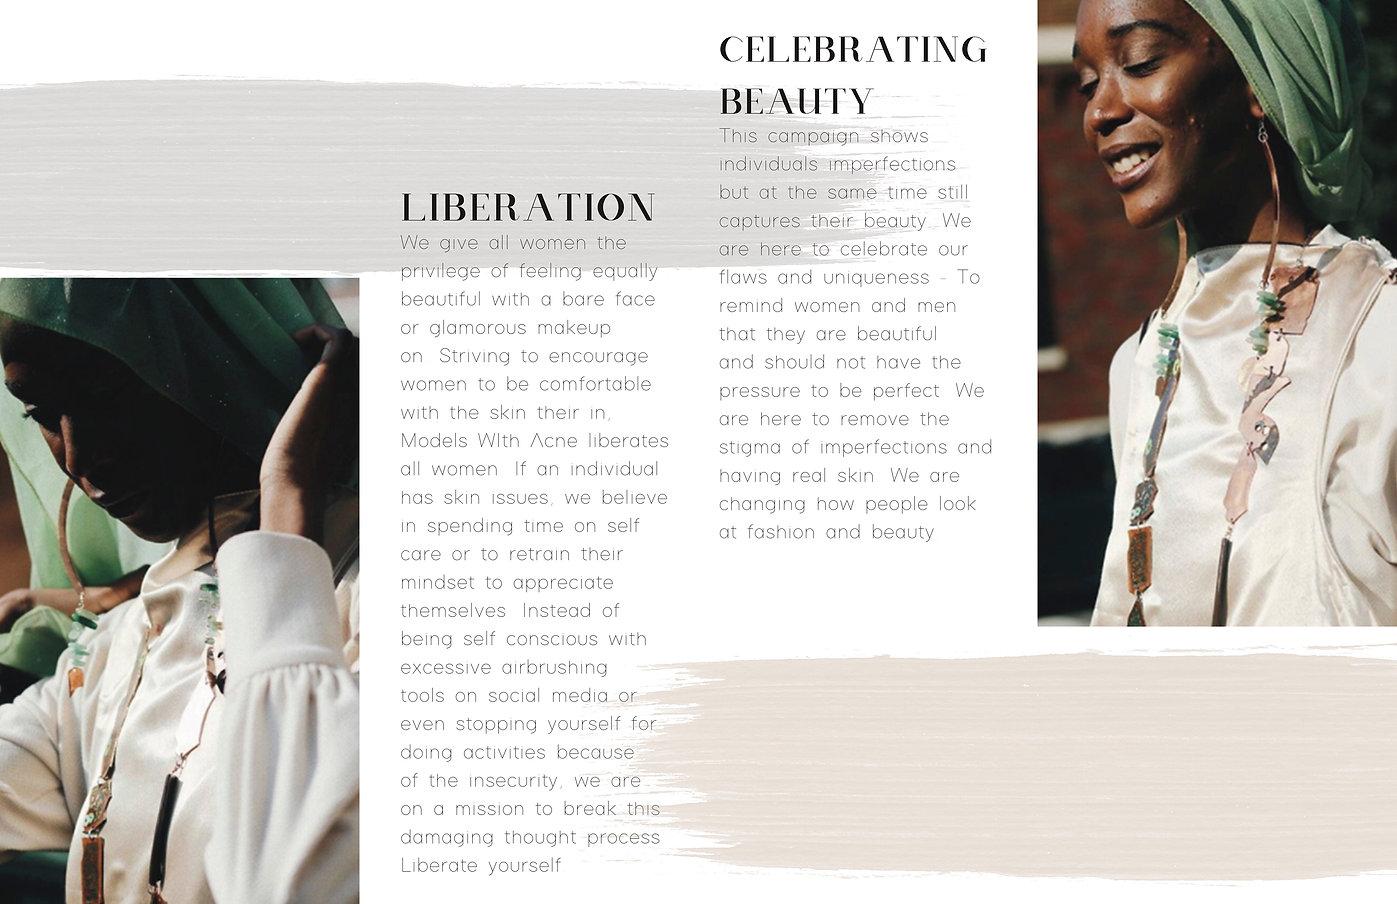 Portfolio-1-page 29.jpg